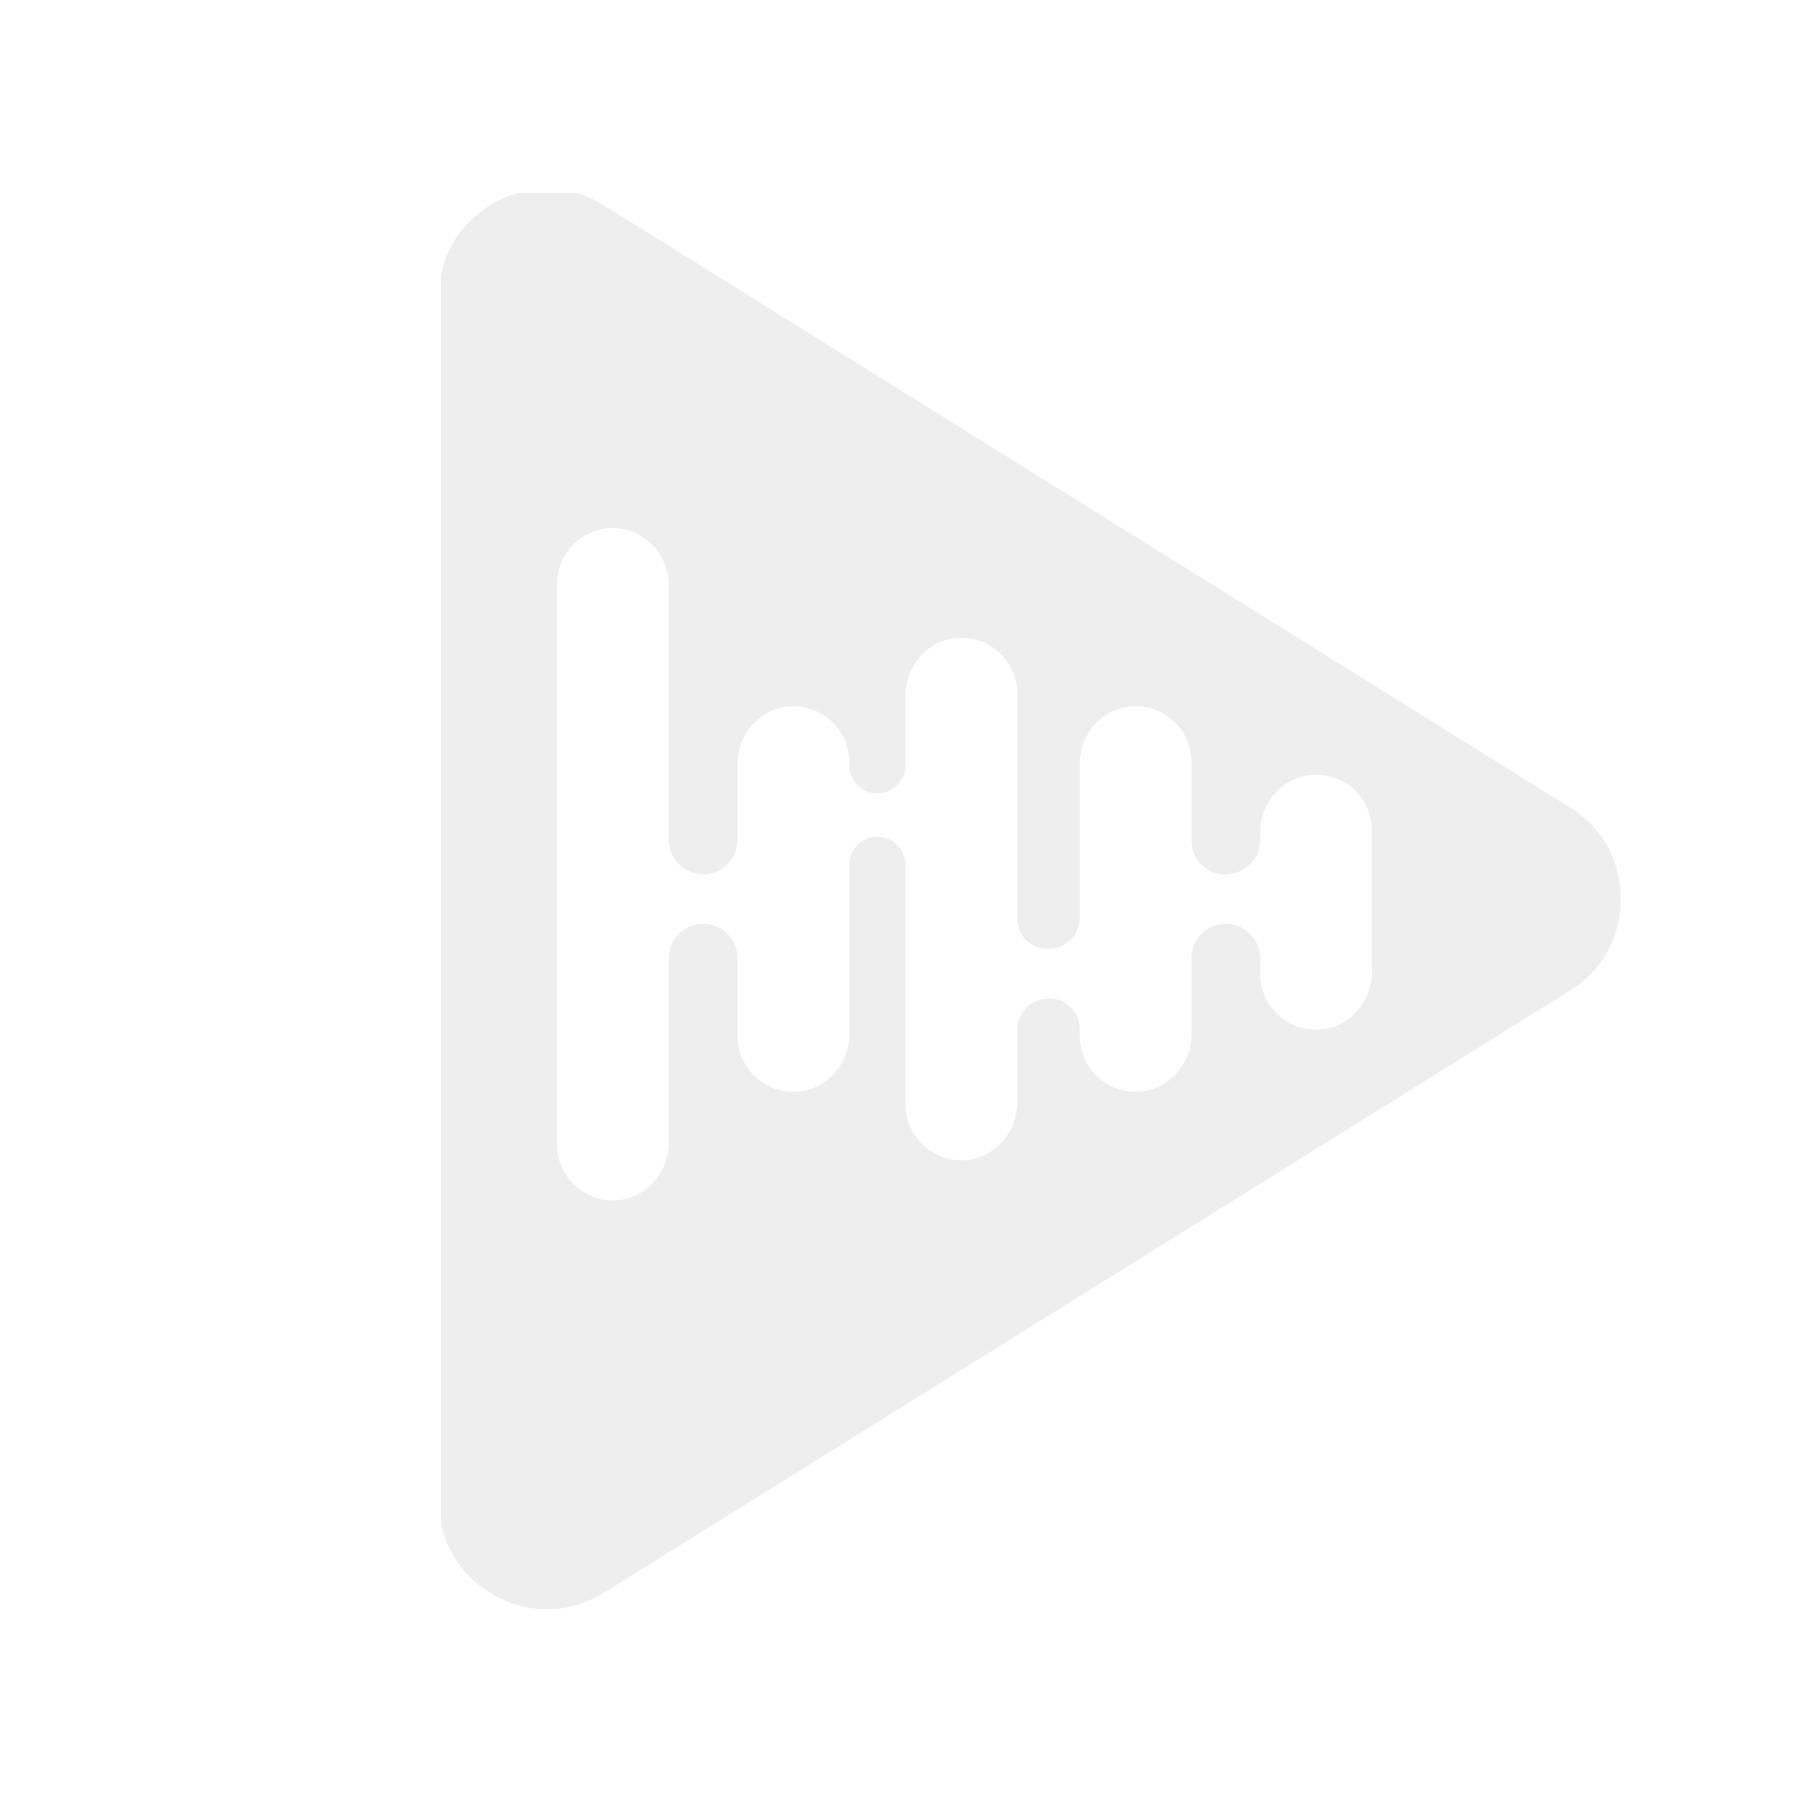 Audison APBMW-F23-HIFI